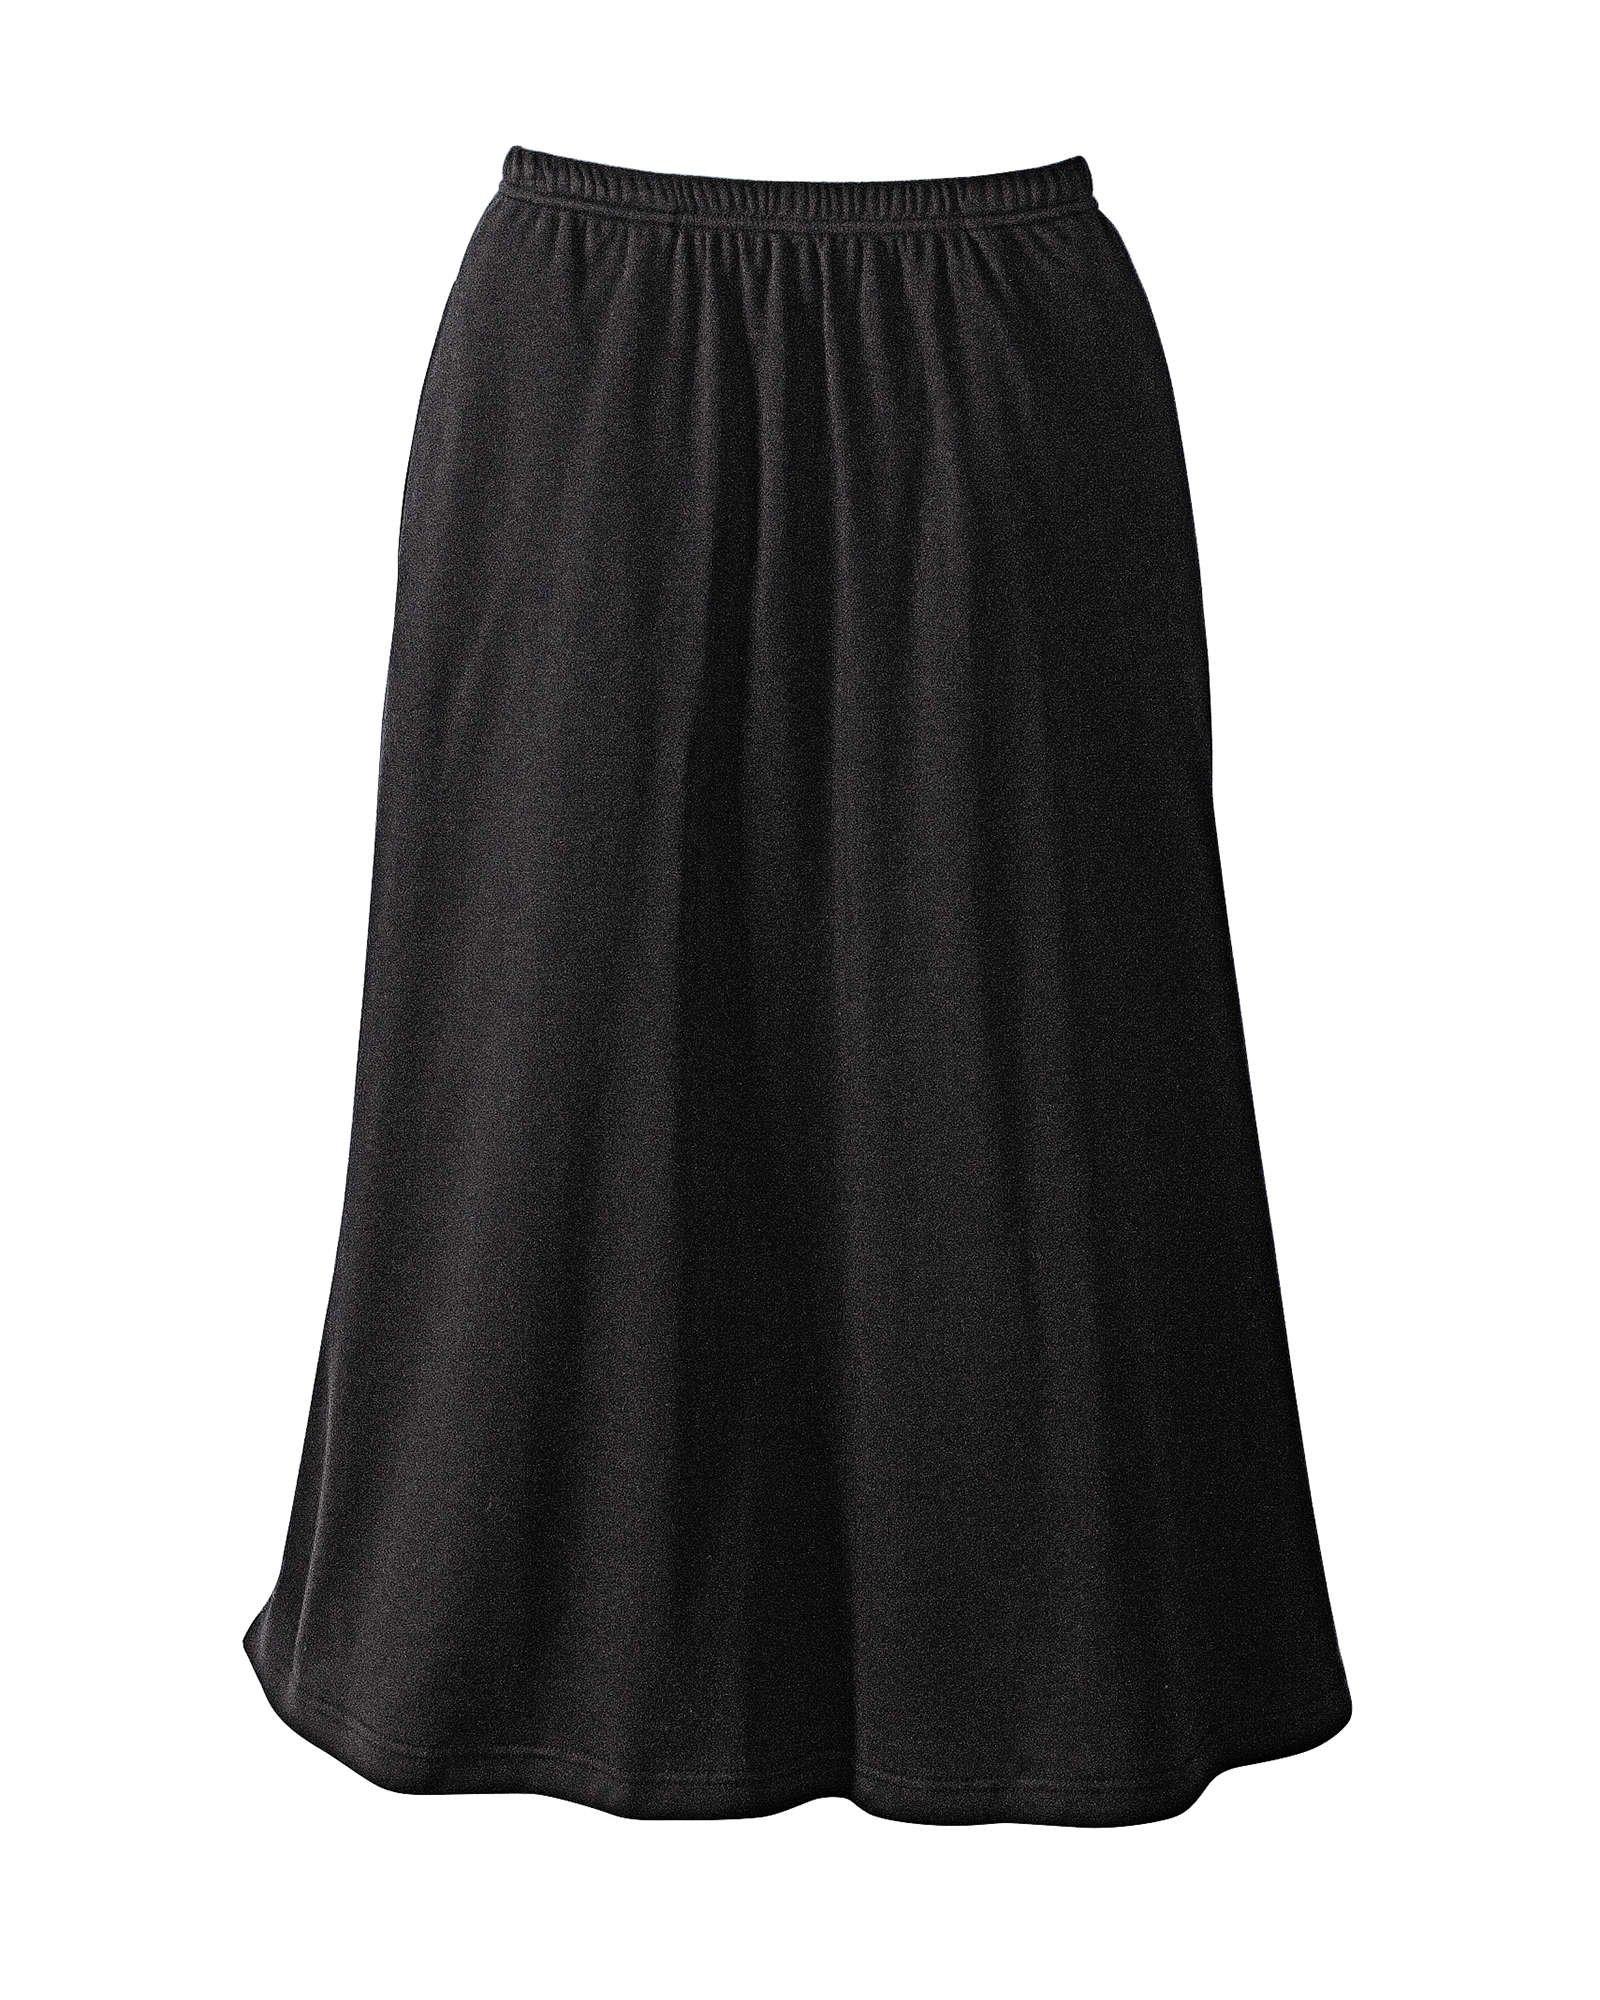 UltraSofts Skirt, Black, Petite XL